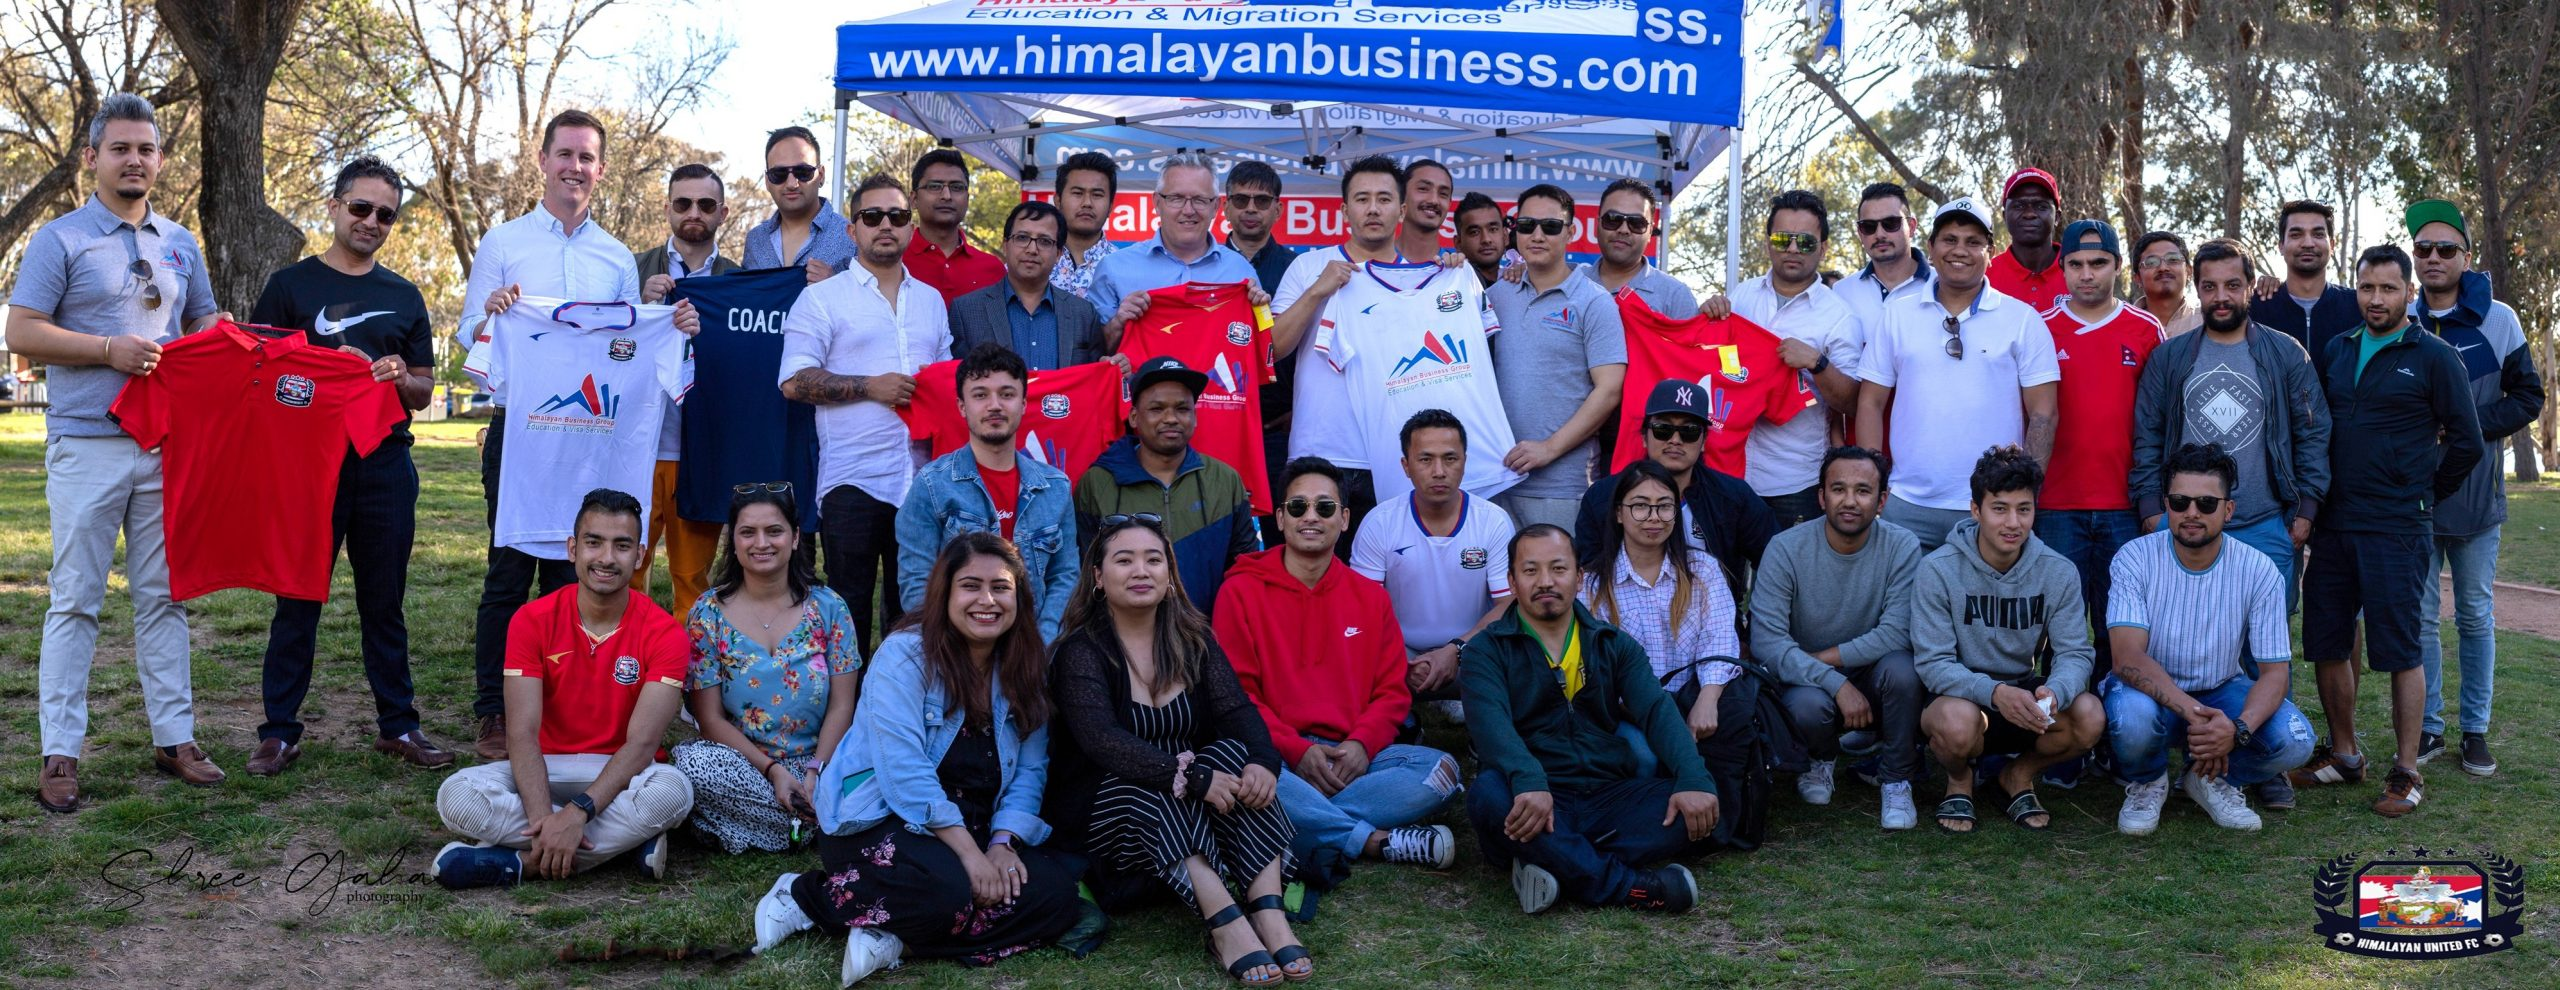 Himalayab Business Group Canberra